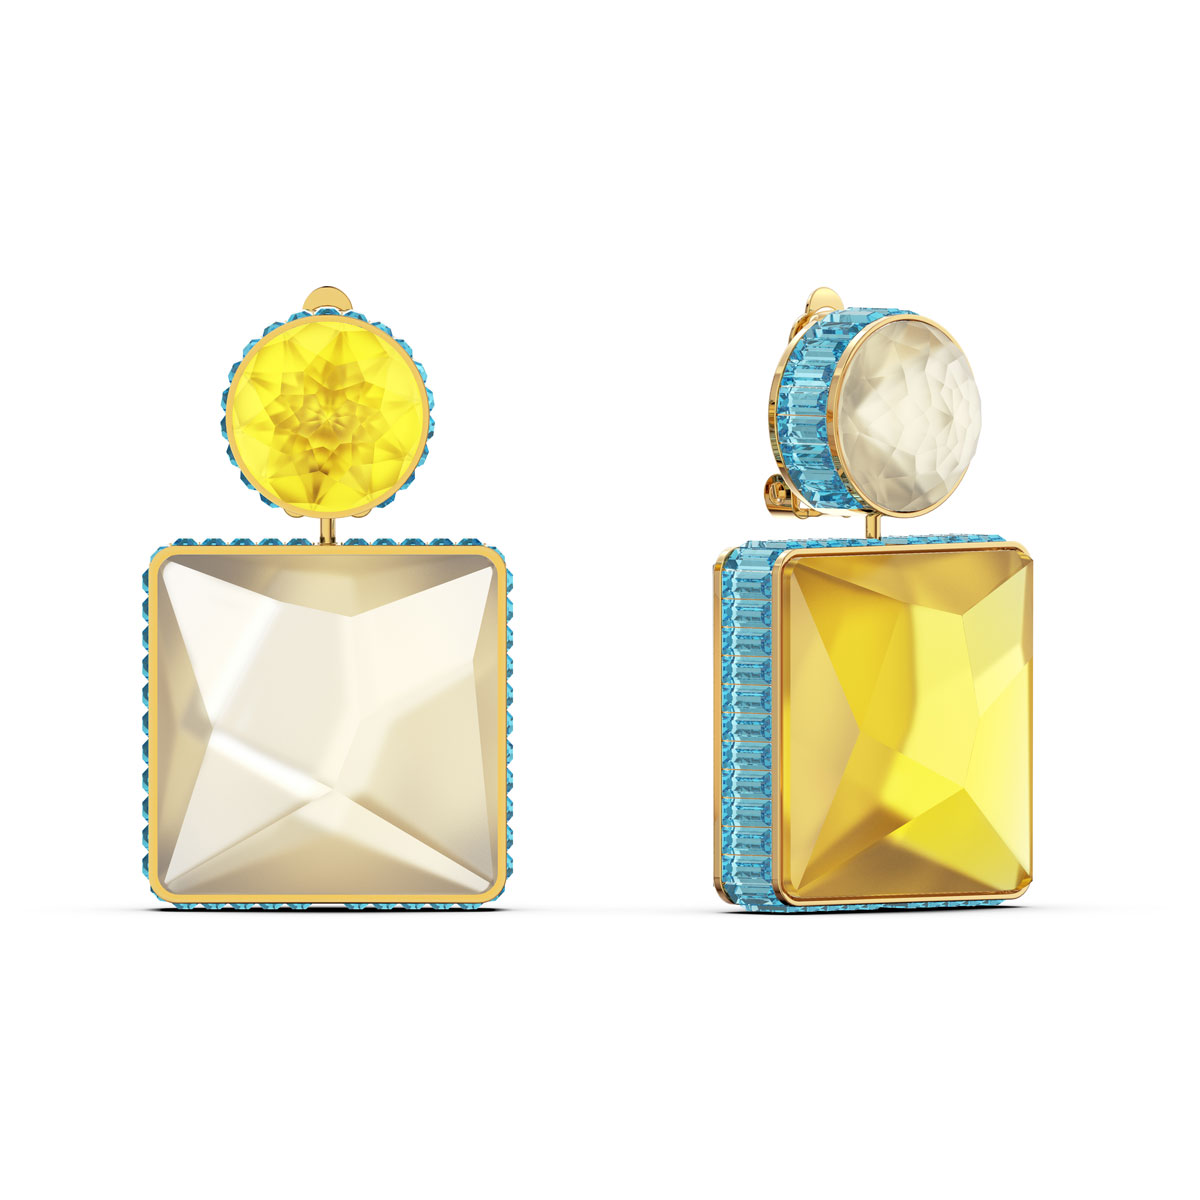 Swarovski Orbita Earrings, Asymmetrical, Square Cut Crystal, Multicolored, Gold-Tone Plated, Set